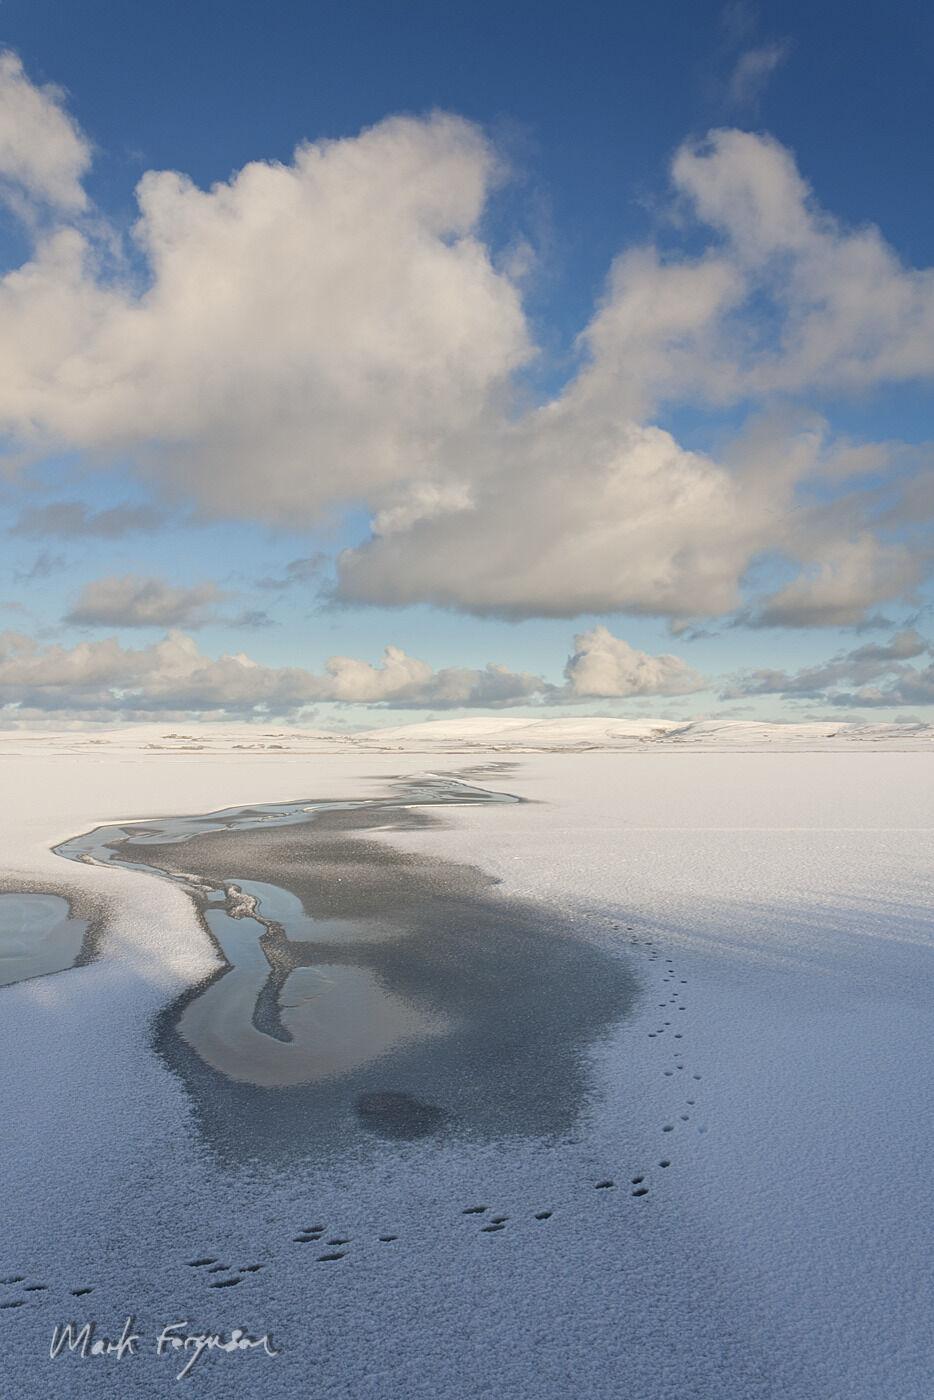 The Harray Loch in January